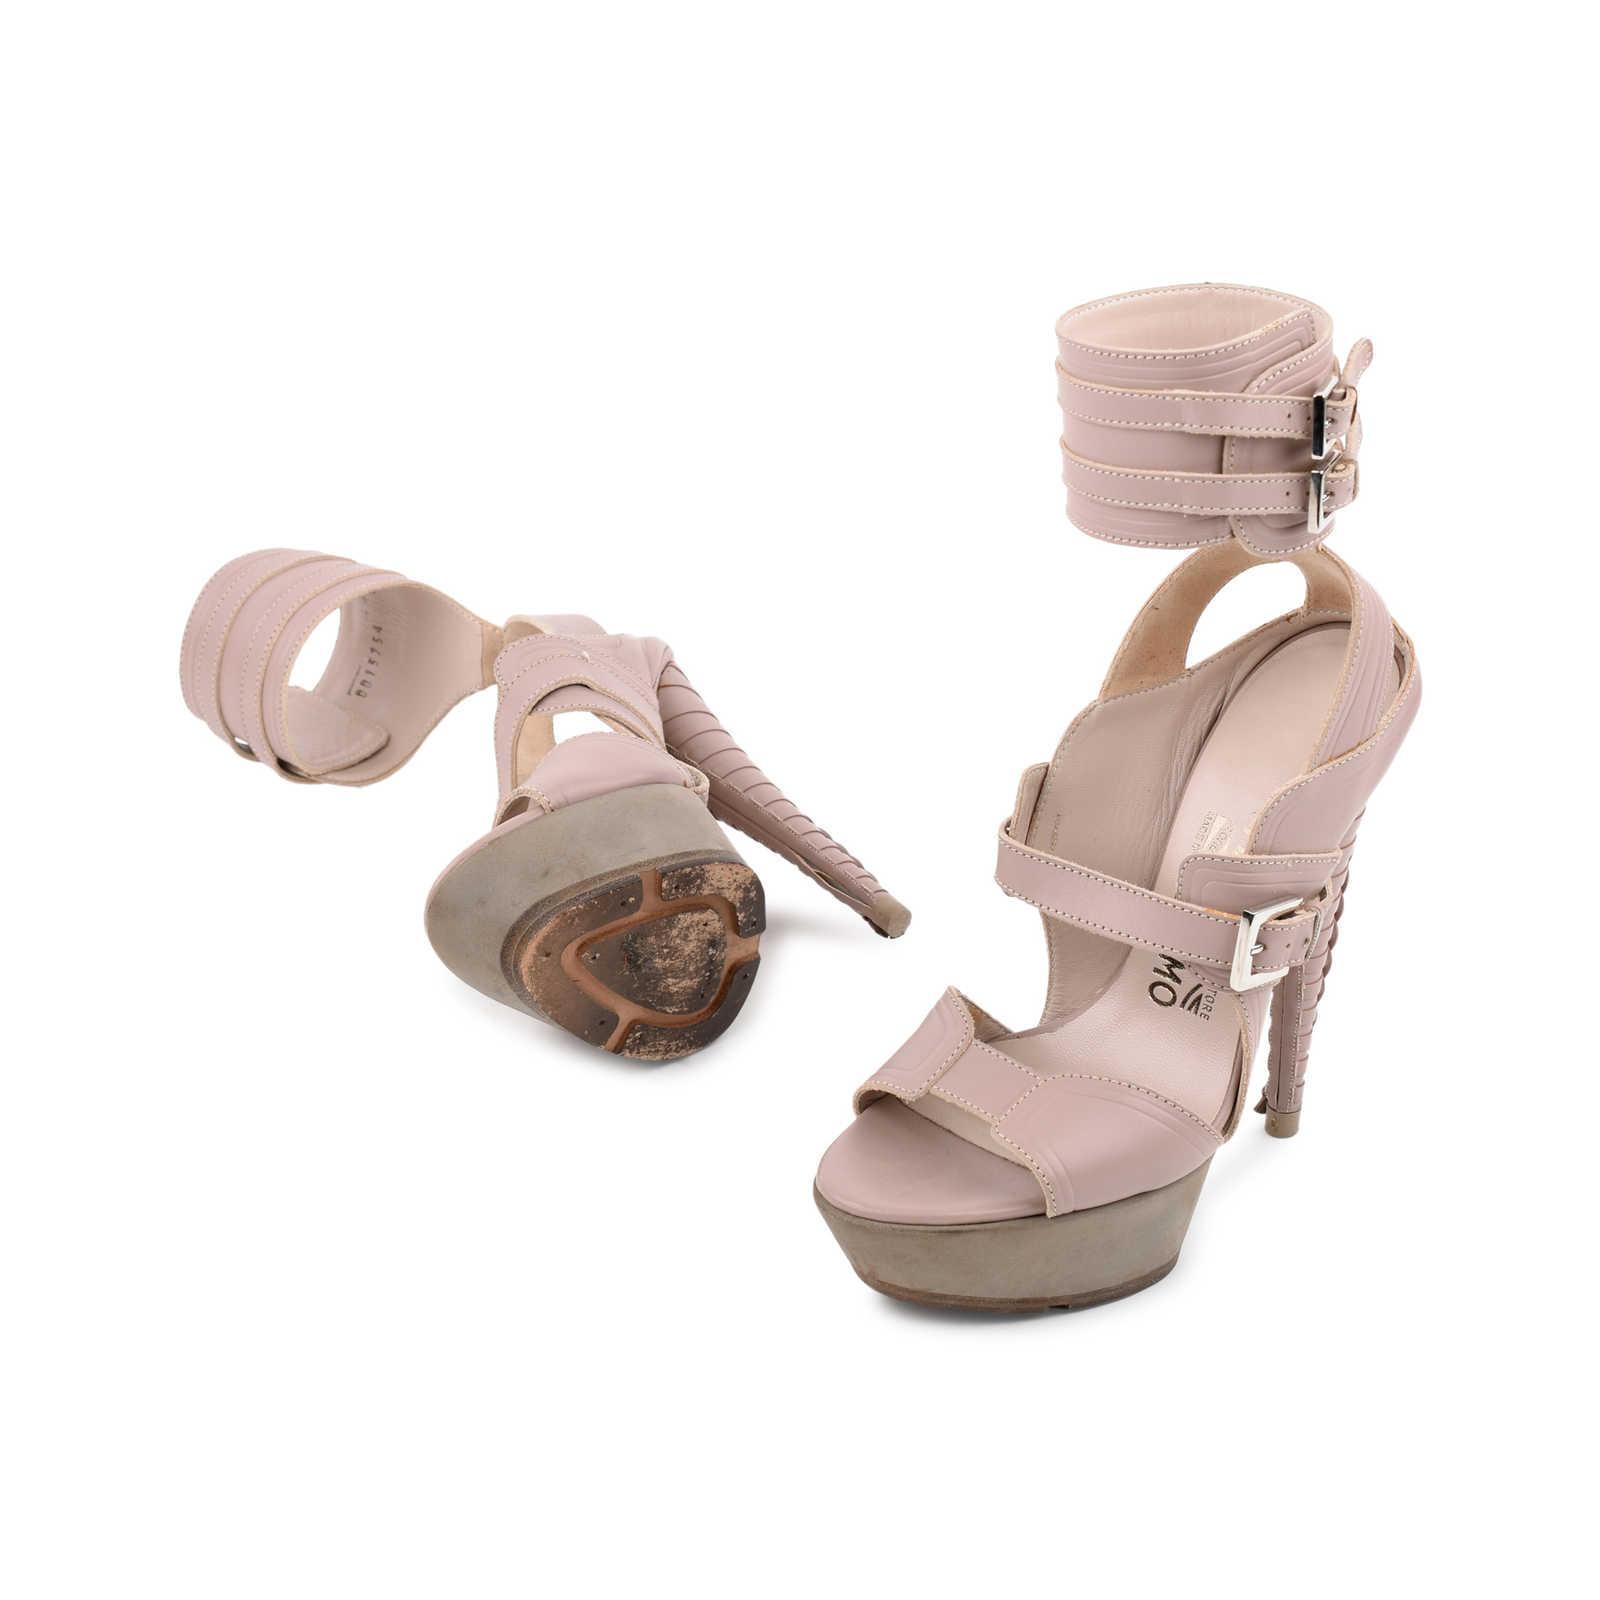 bc7077c4688d27 ... Authentic Second Hand Salvatore Ferragamo Braided Platform Sandal  (PSS-080-00221) ...